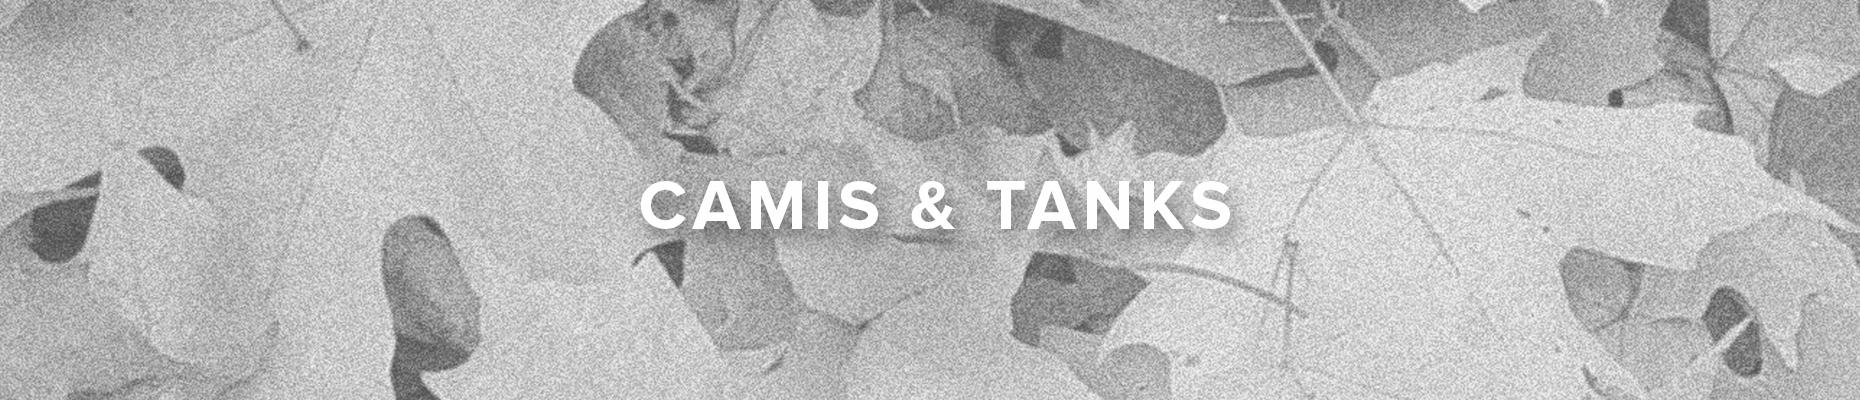 Camis & Tanks